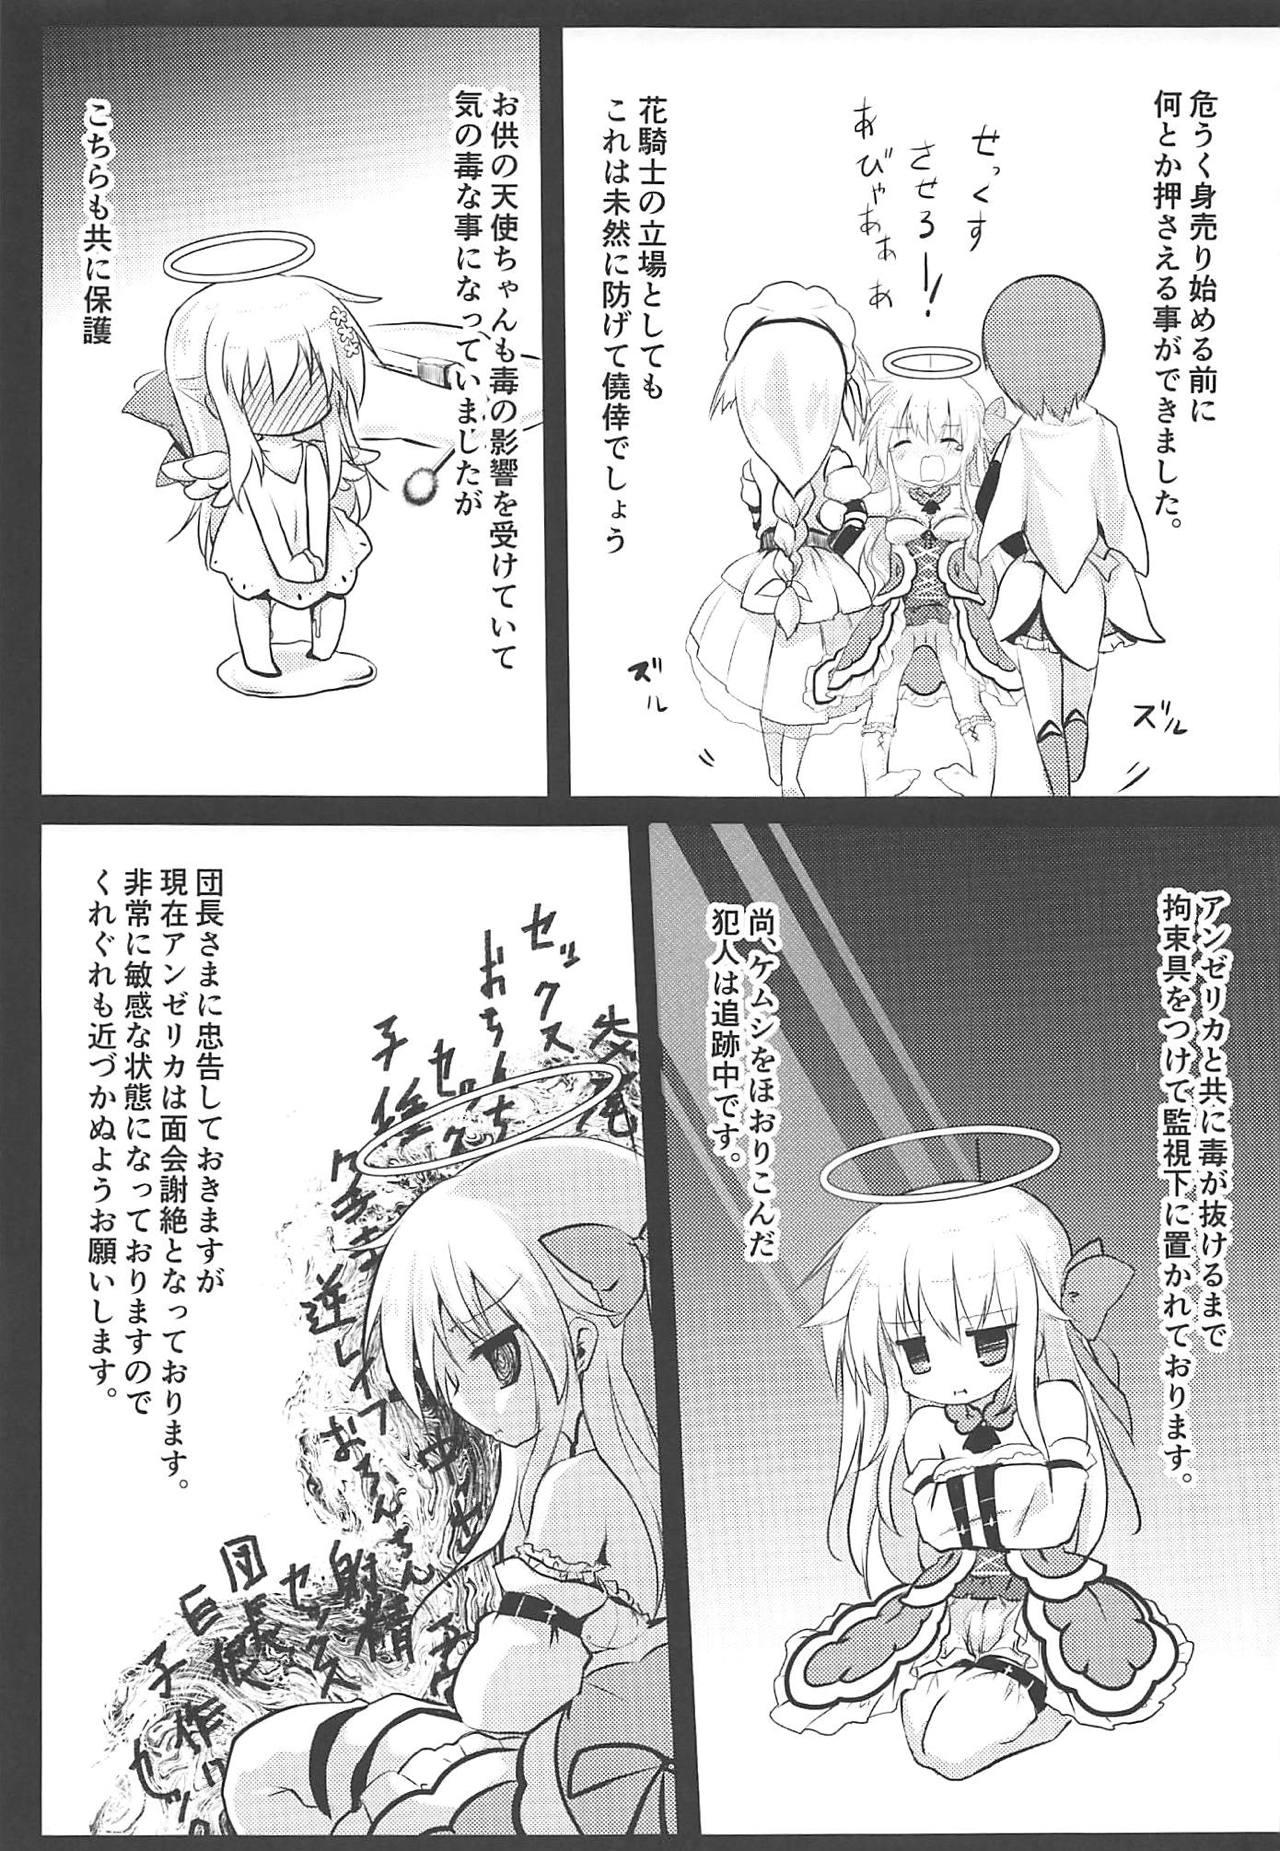 Gaichuu Higai Houkokusho File 3 19